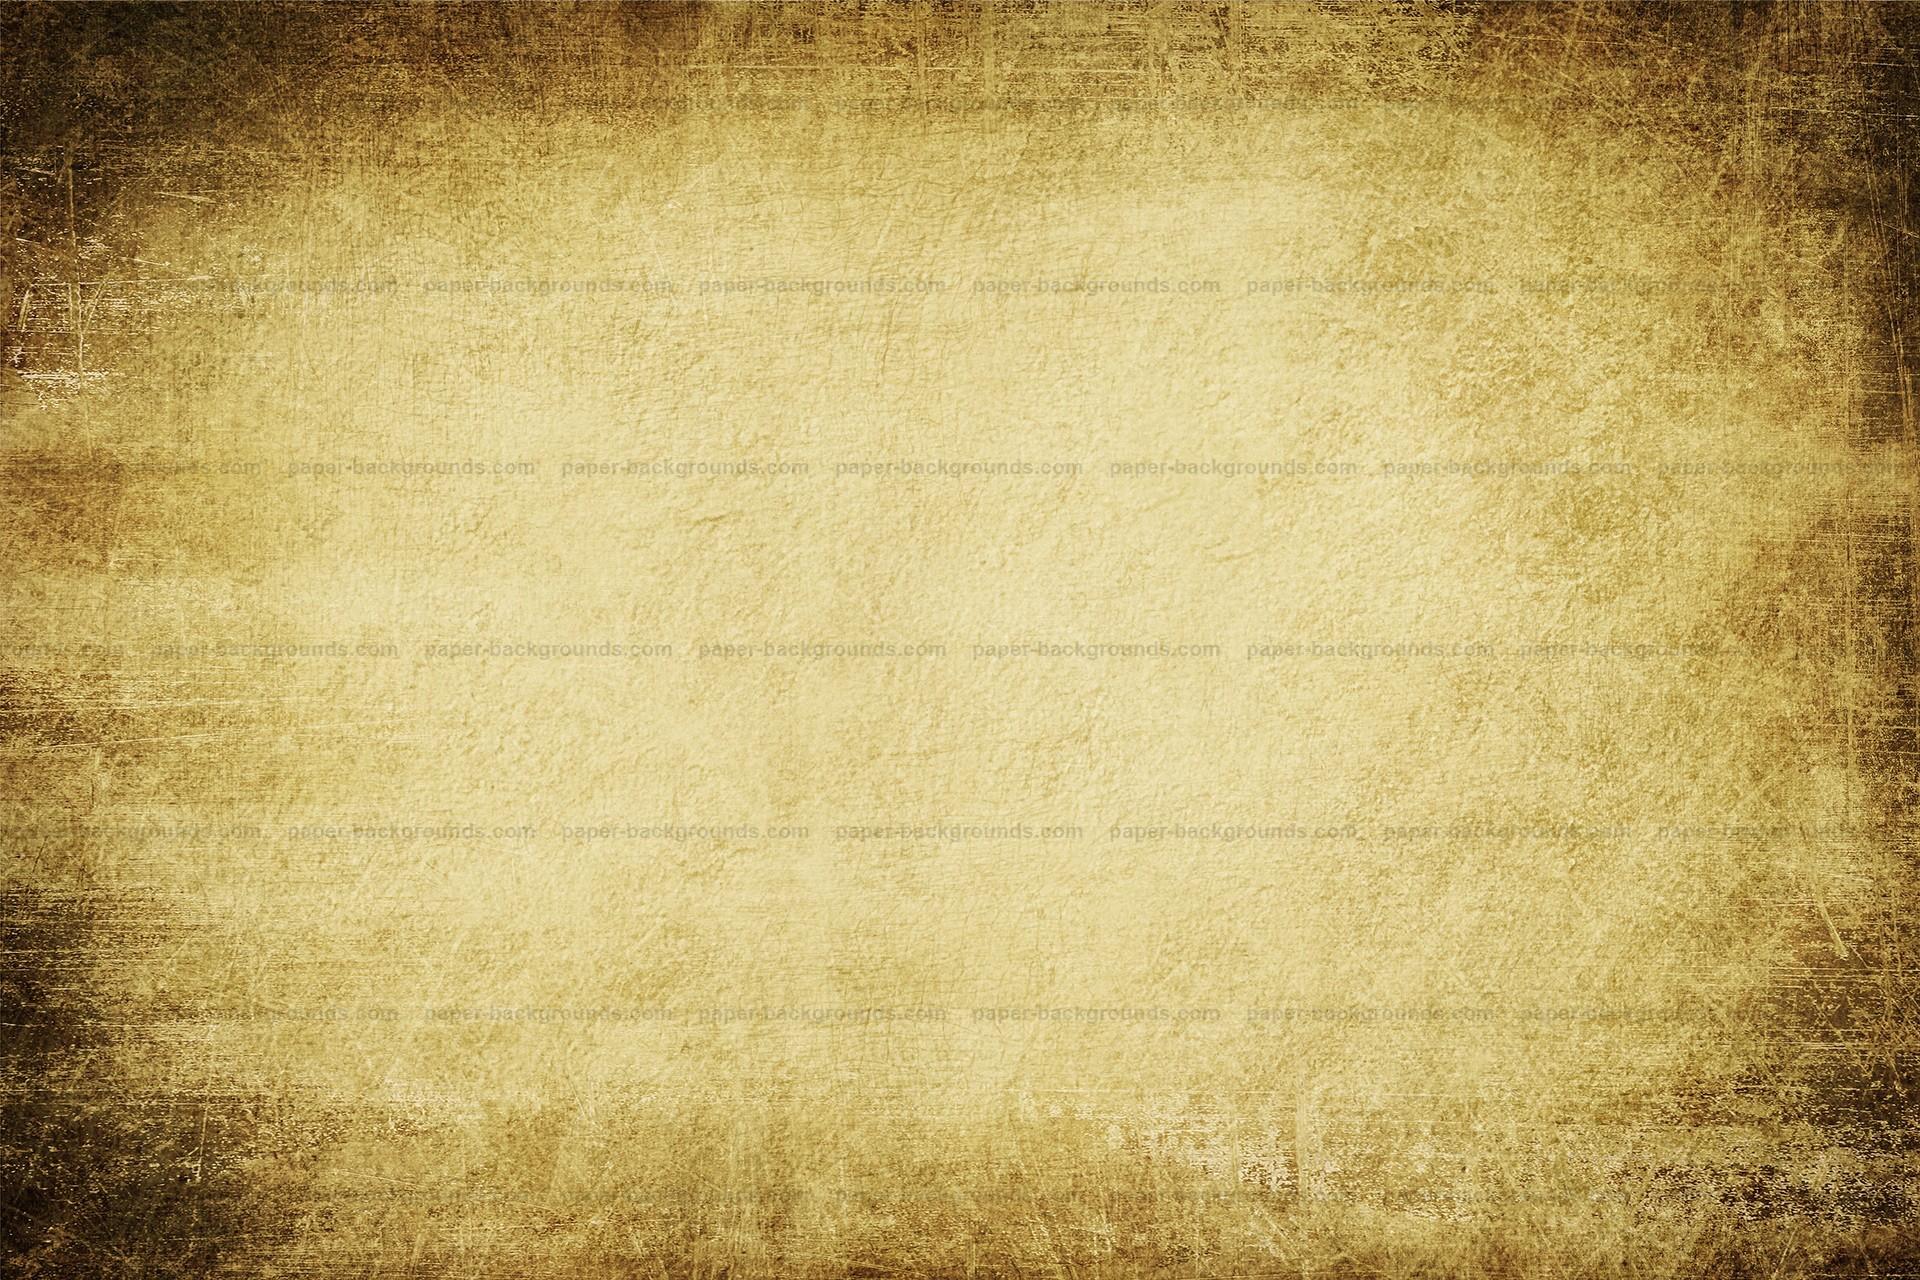 Colors Hd Backgrounds Texture Wallpapers Wallpaper Texture Color #3770